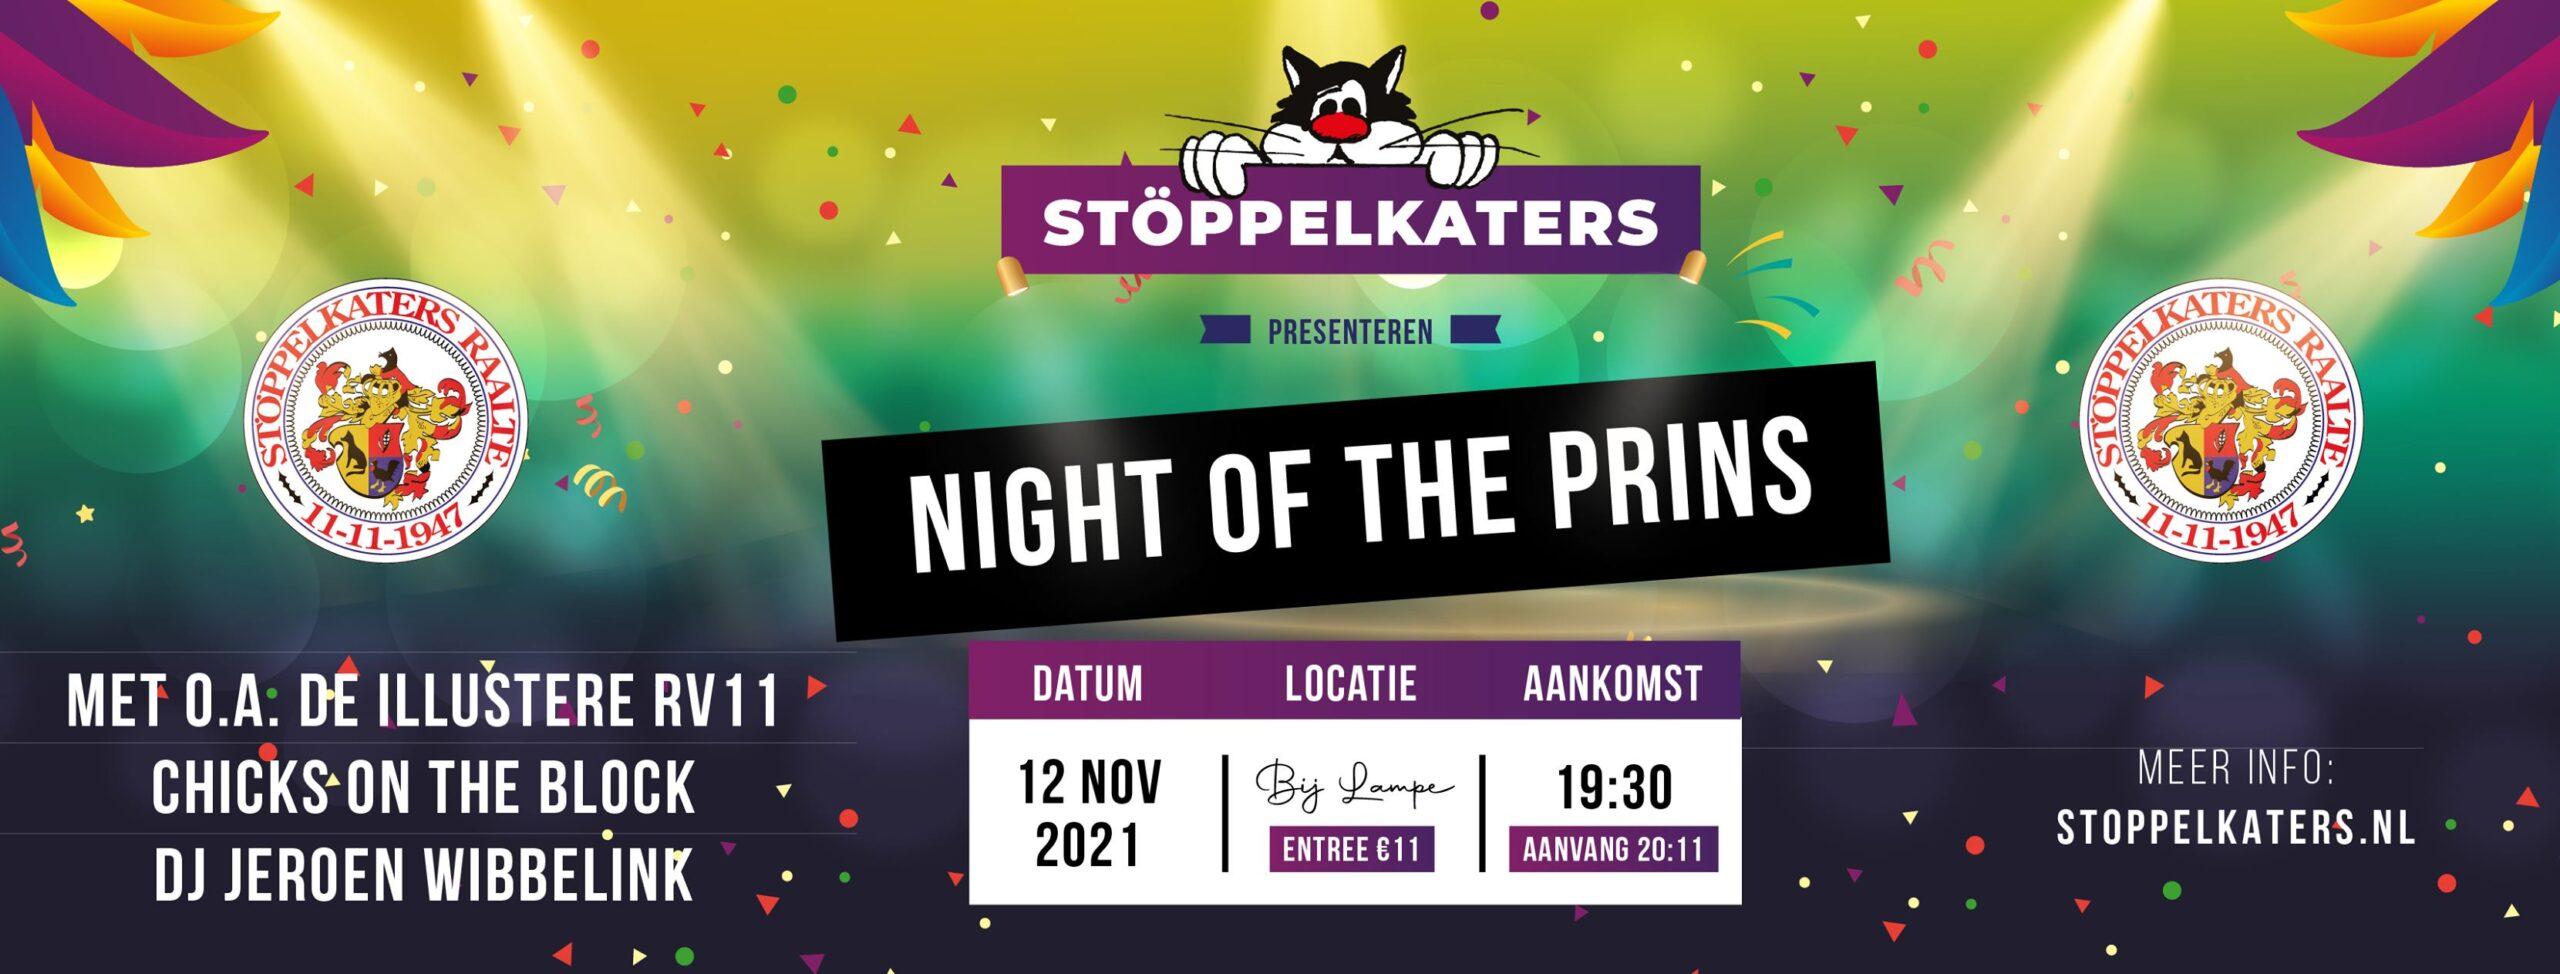 Night of de Prins